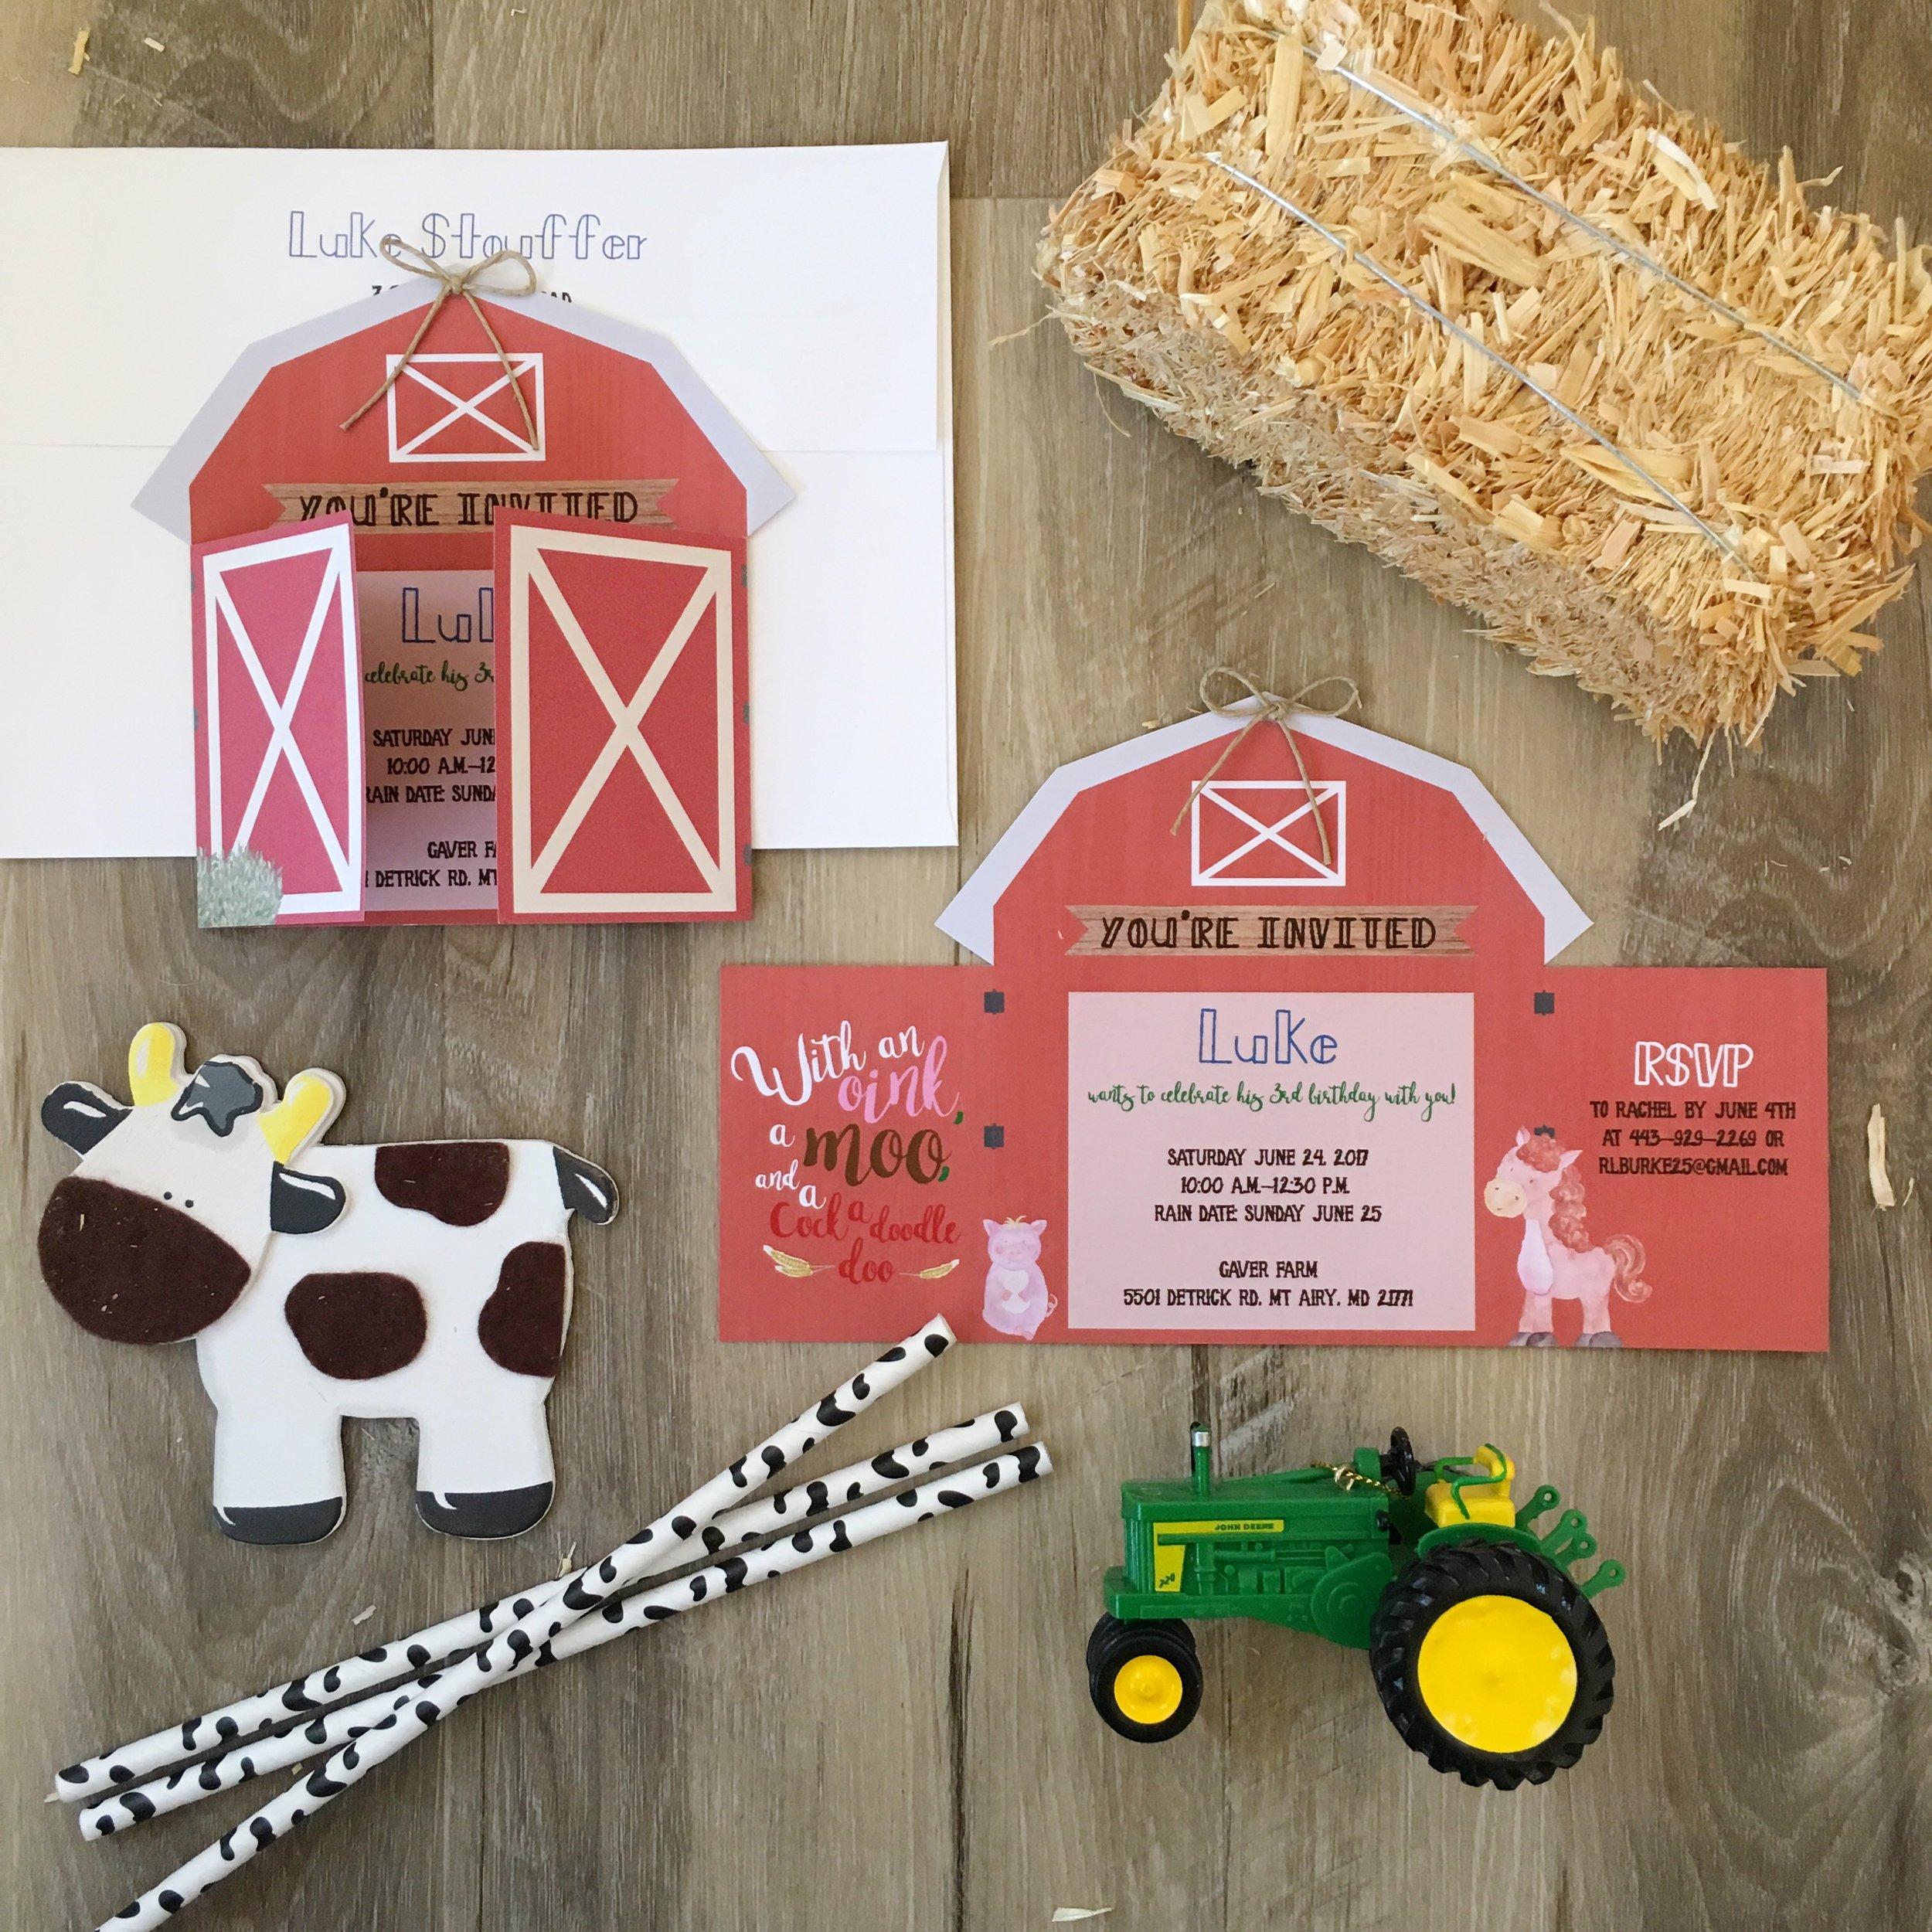 Central PA, Birthday Invitations, JesSmith Designs, custom invitations-04-05 09.34.03.jpg